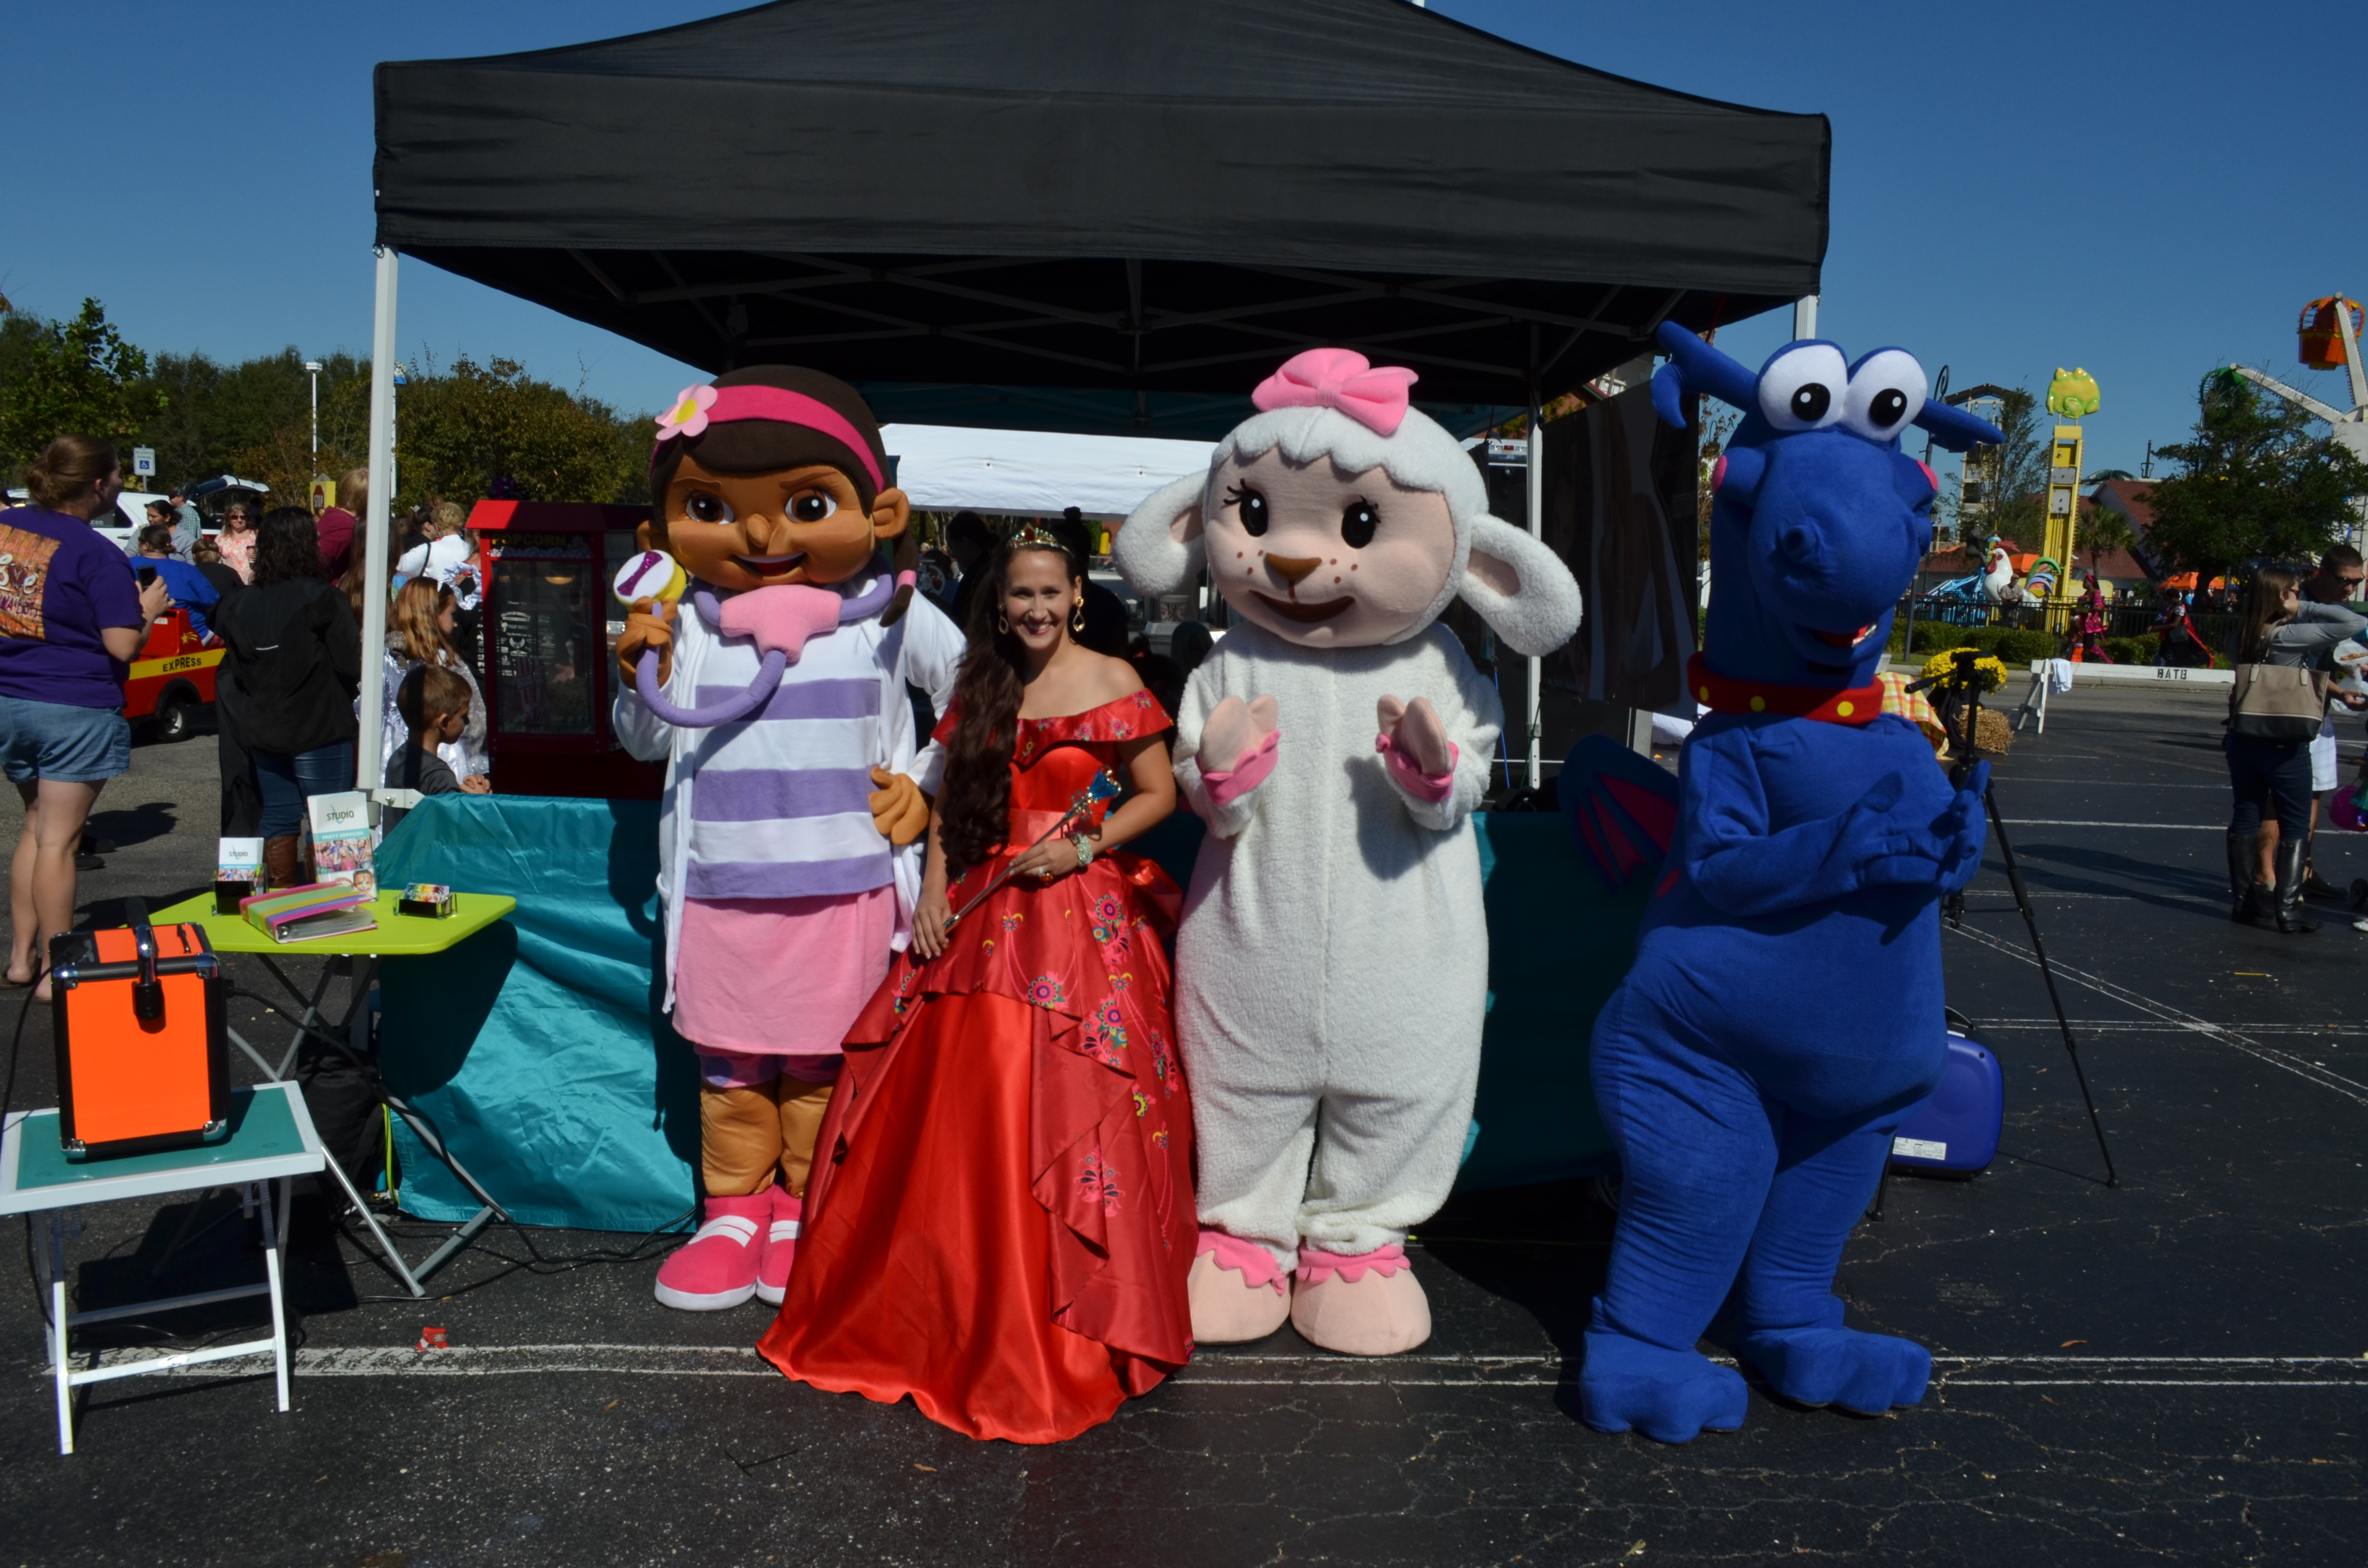 Disney Character Performers